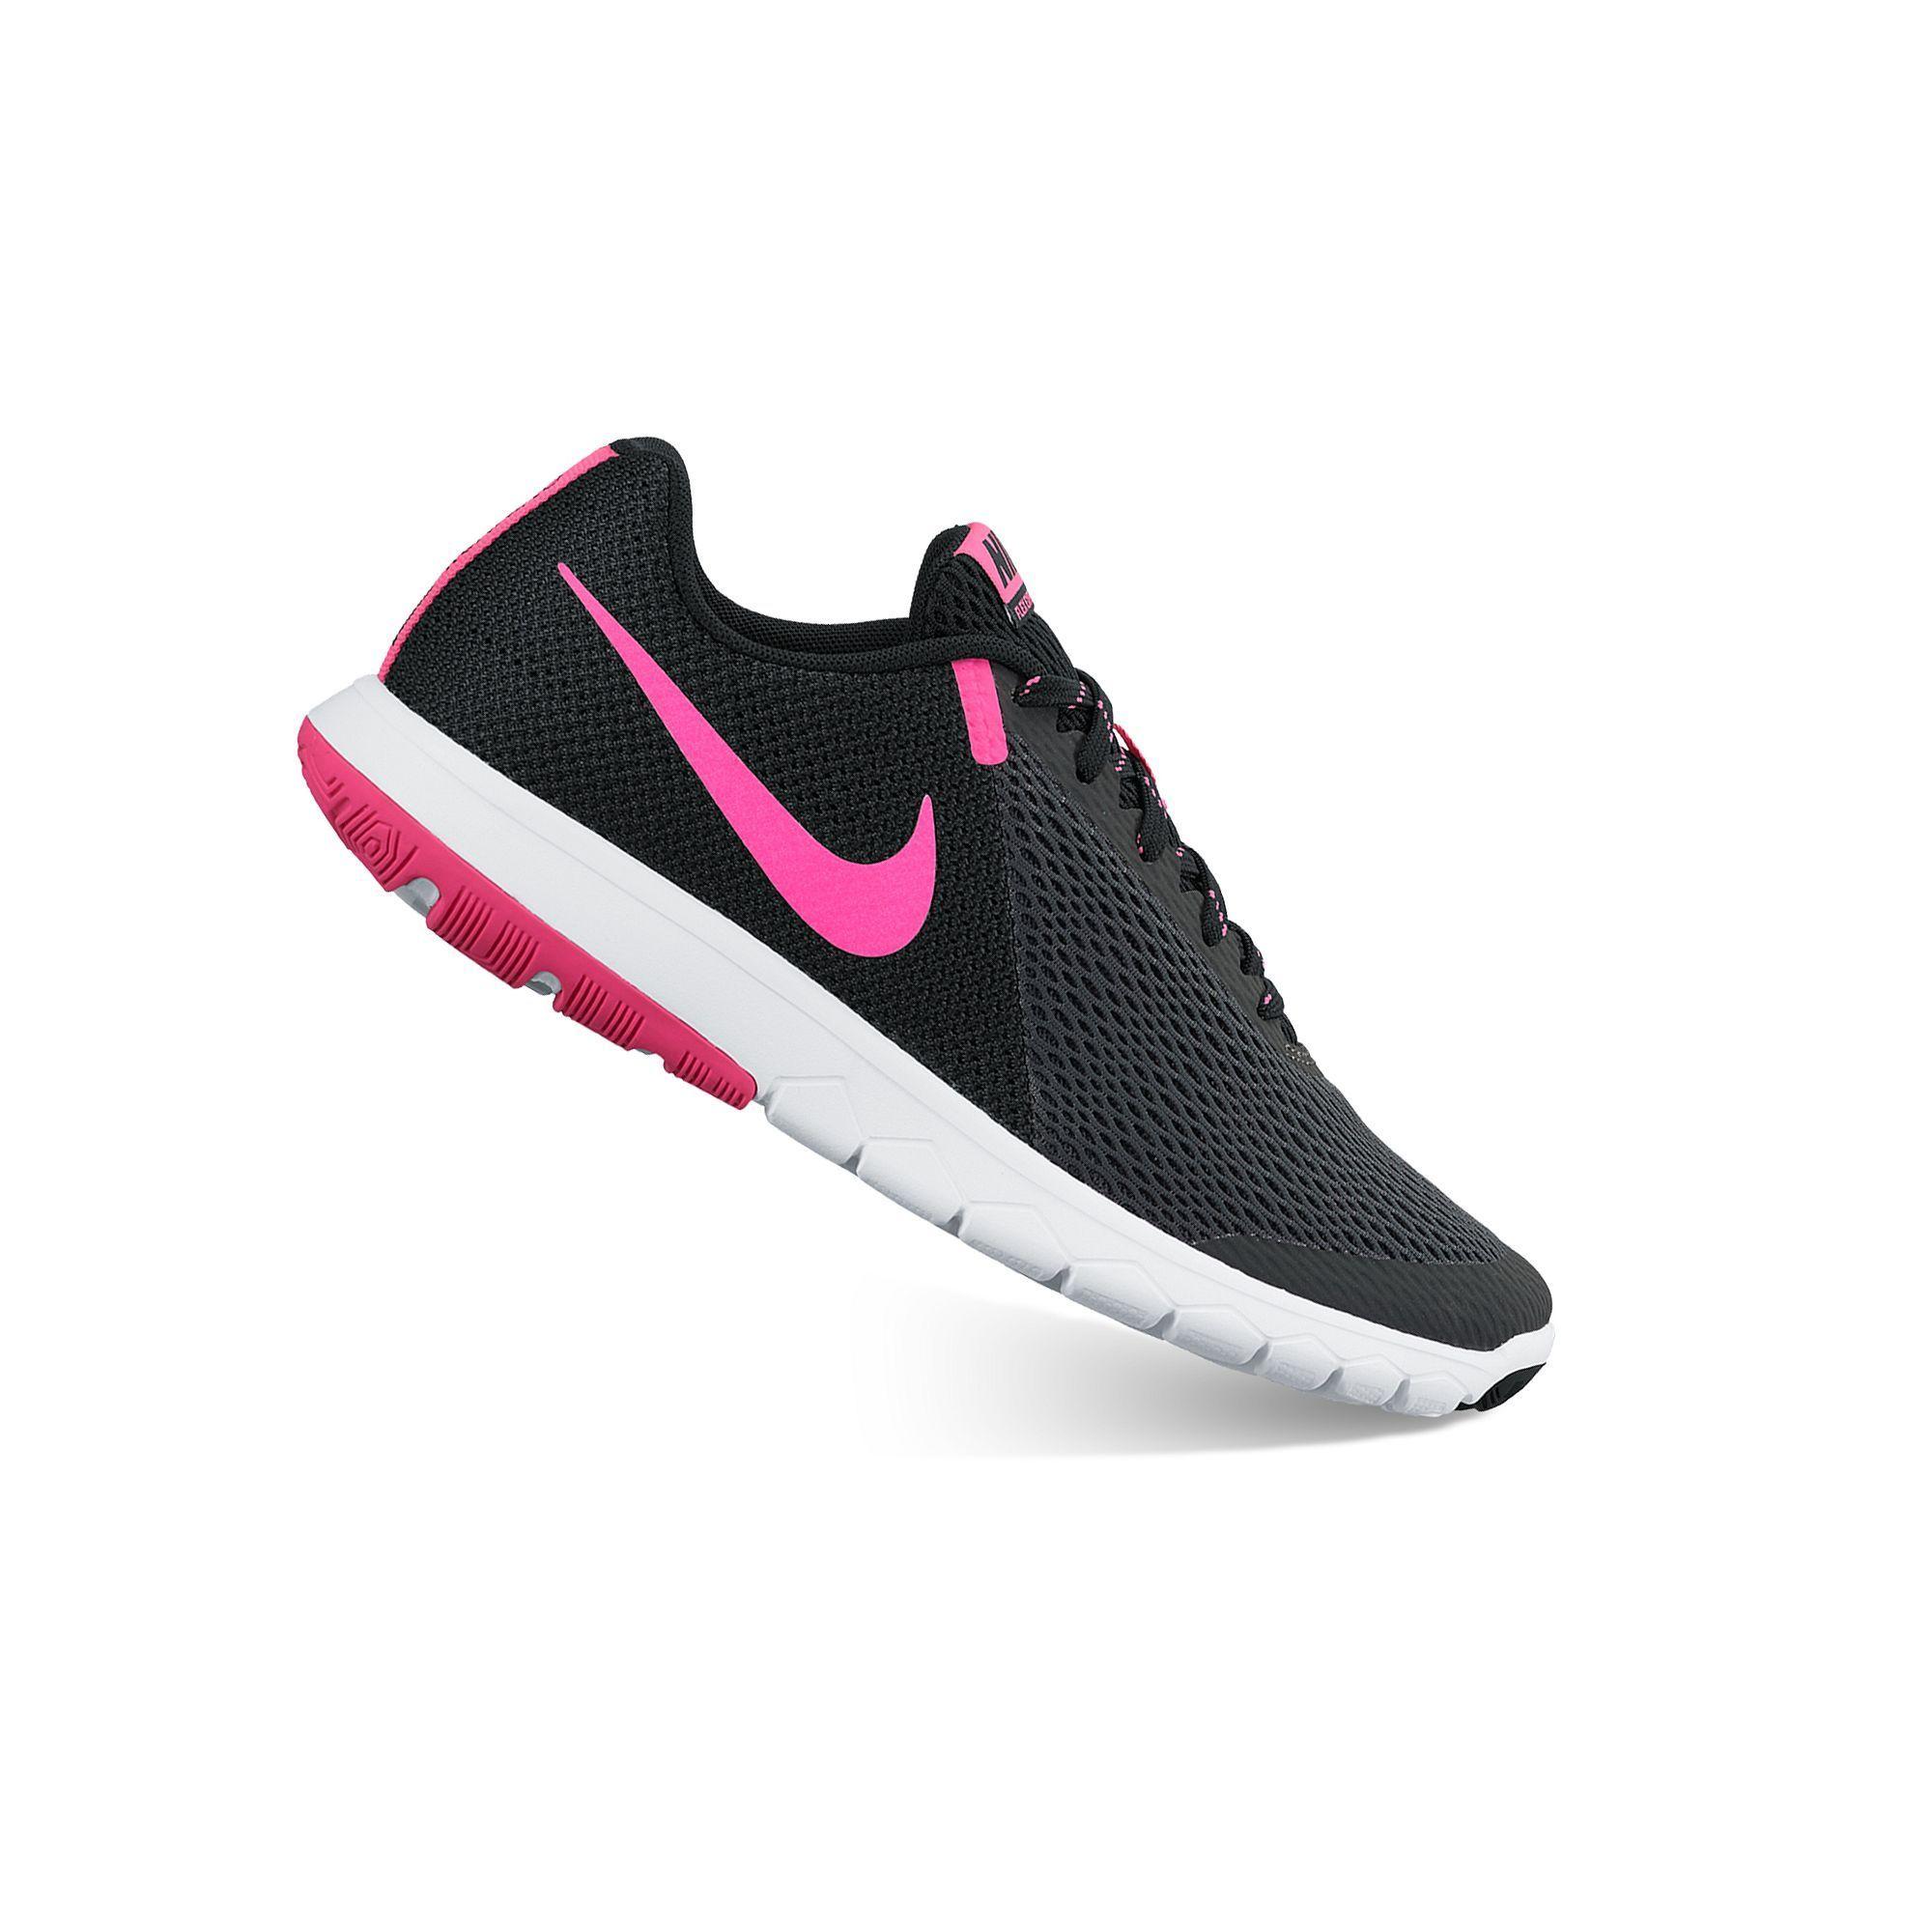 8cc031401db4f Nike Flex Experience 5 Women s Running Shoes